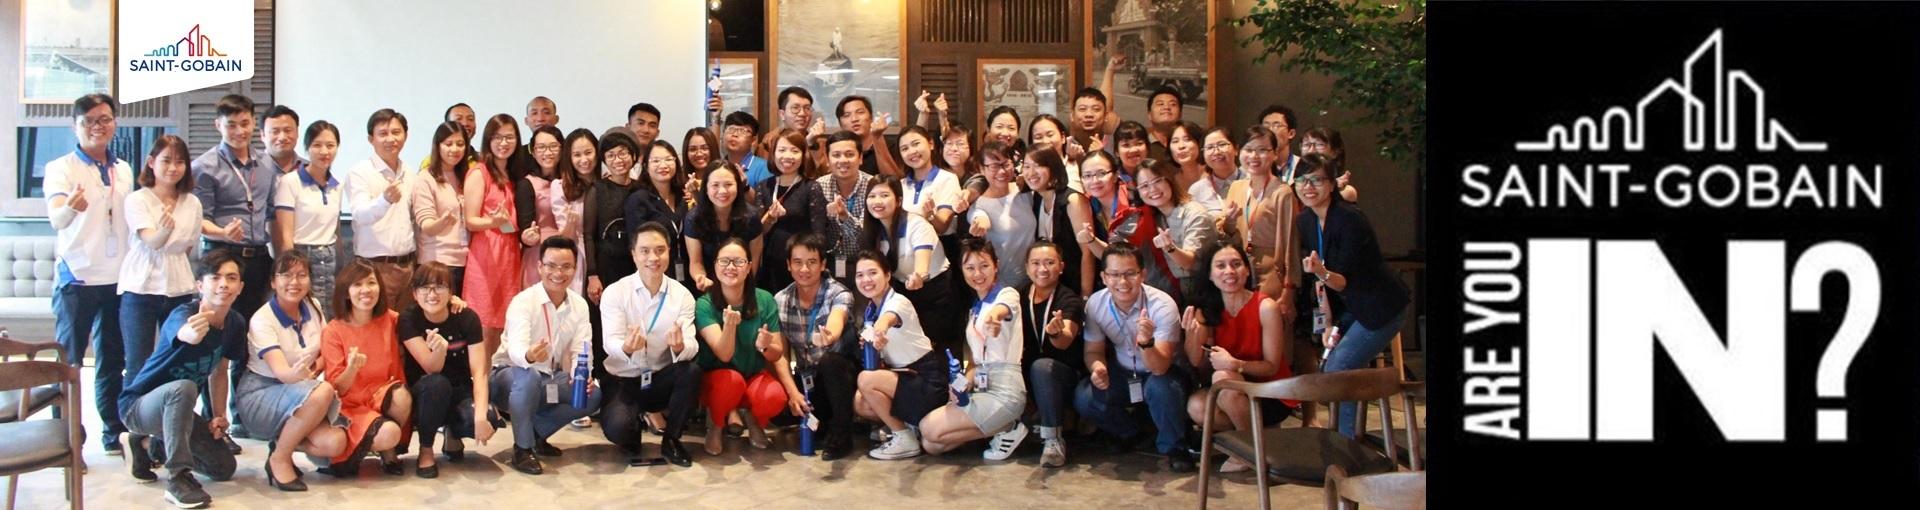 Open jobs at Saint-Gobain Vietnam